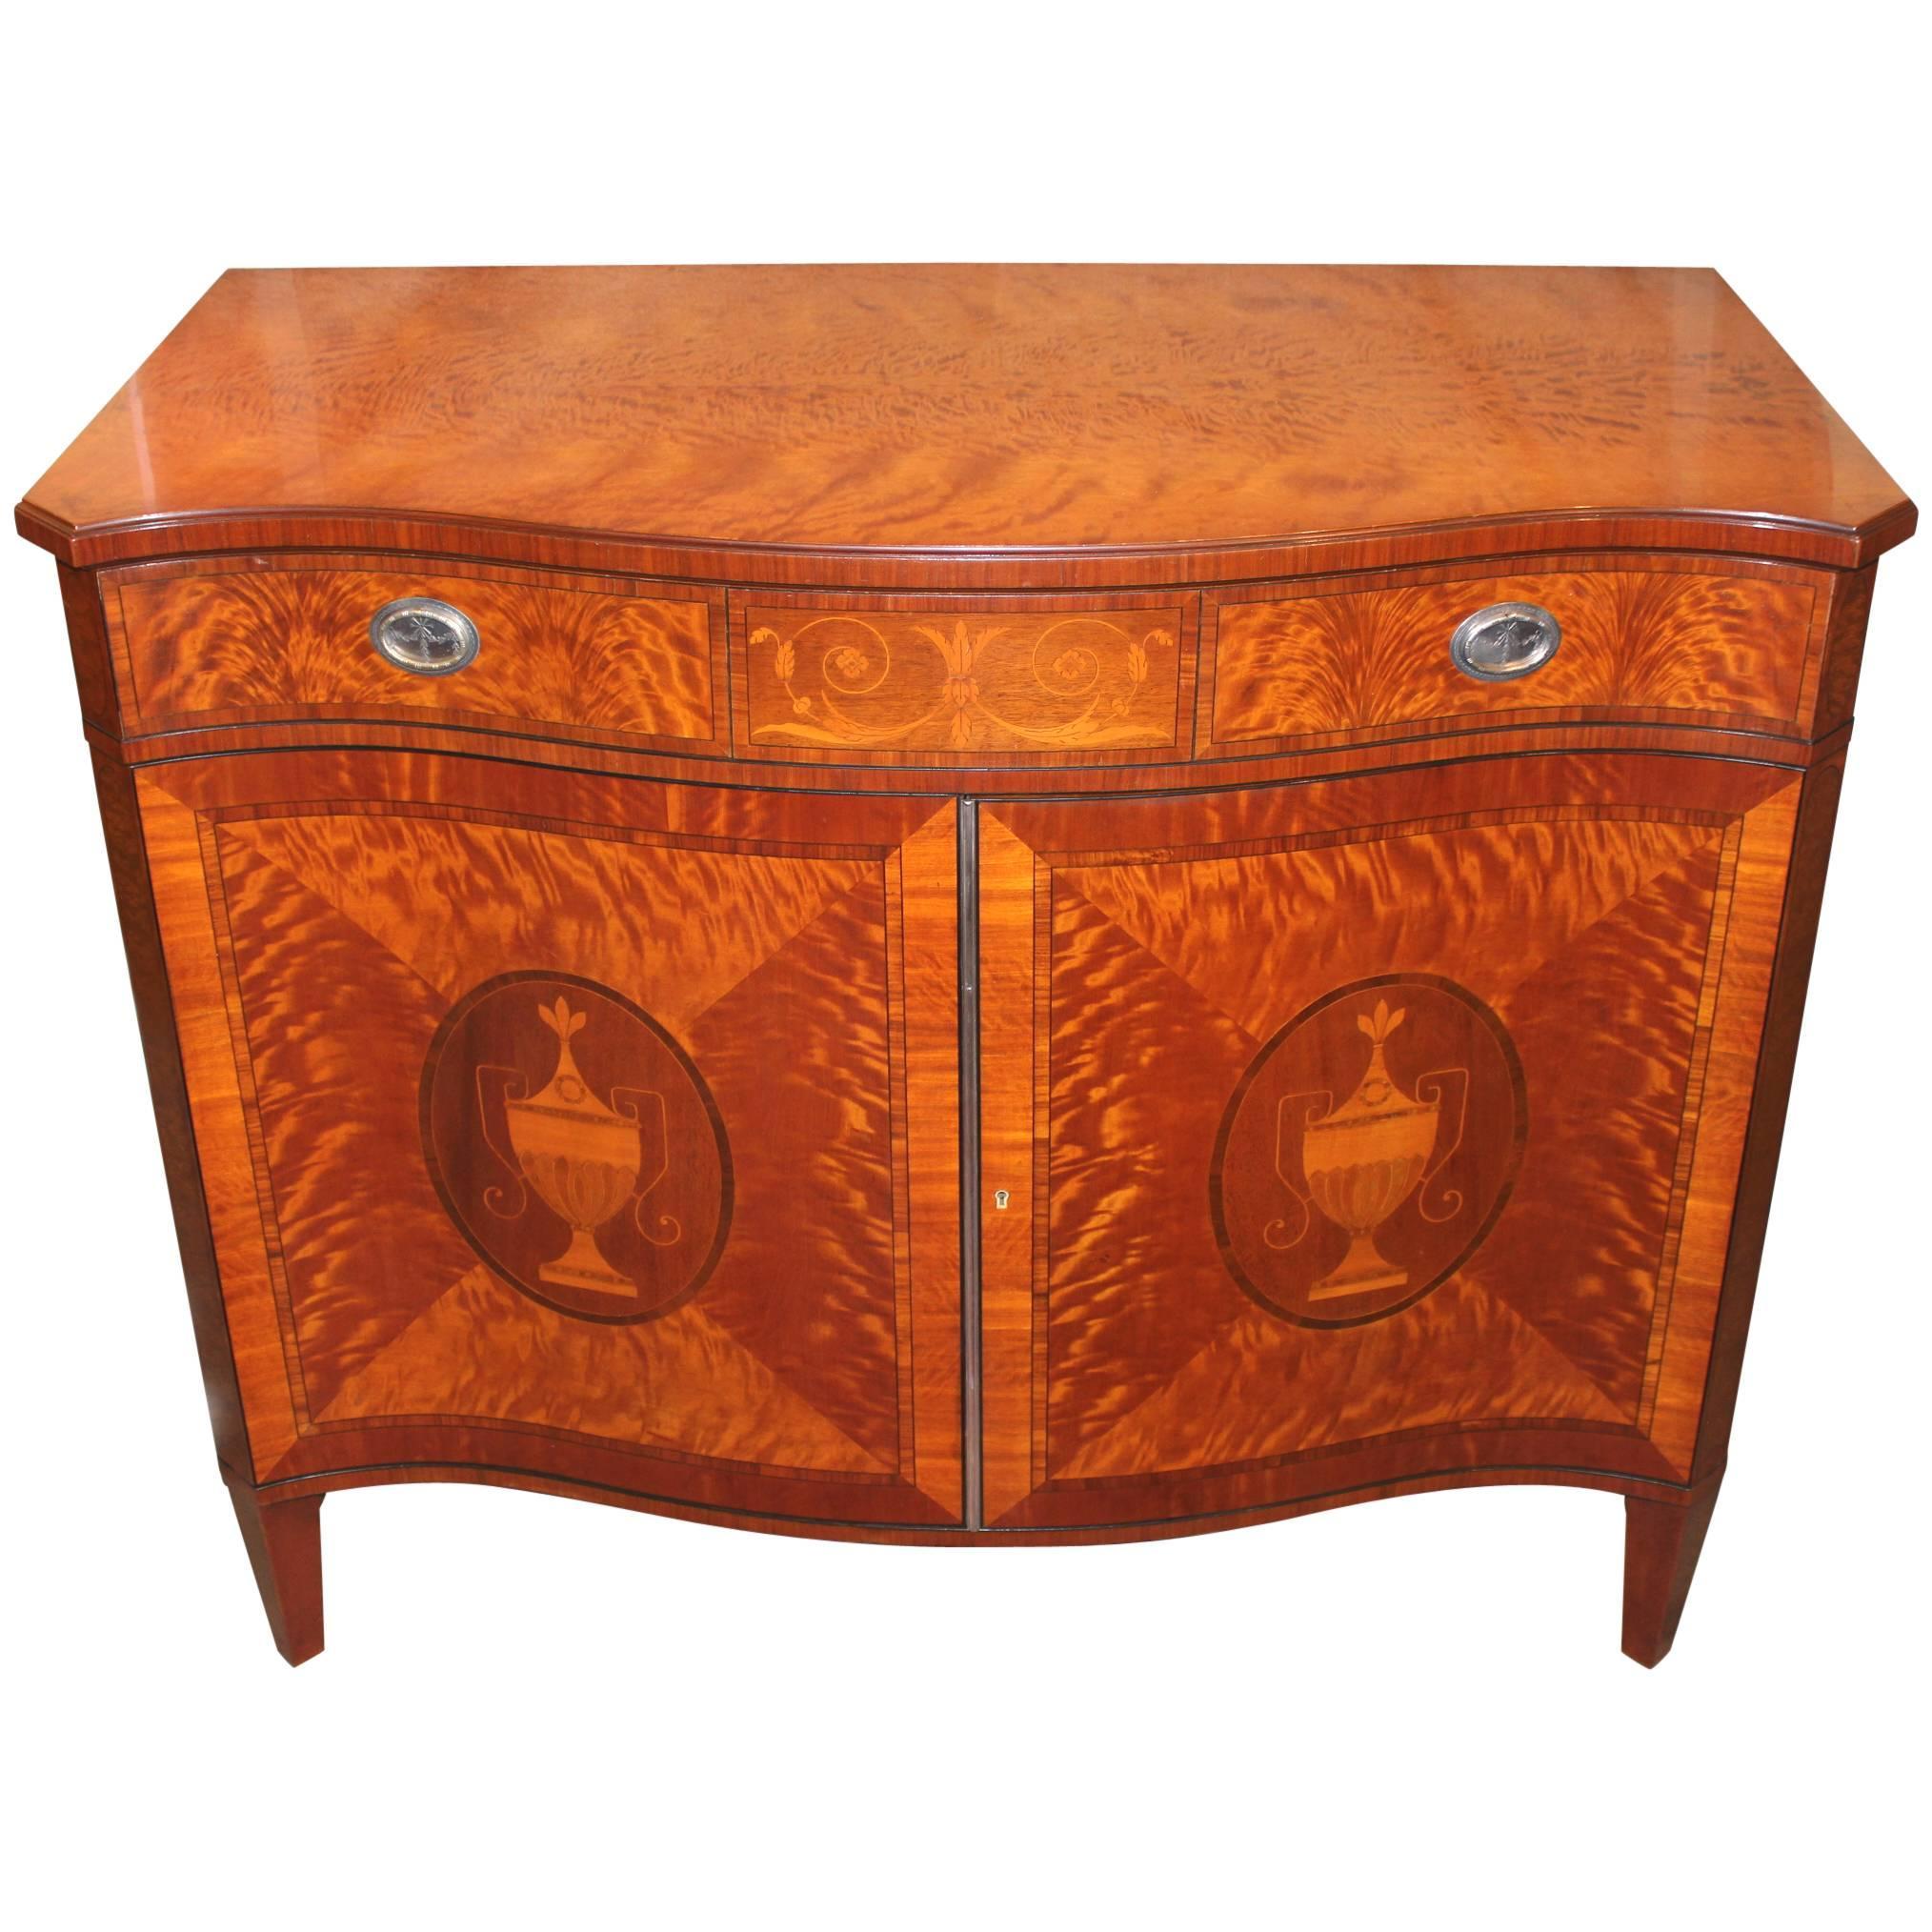 Schmieg & Kotzian, Adam Style Satinwood Serpentine Cabinet or Server